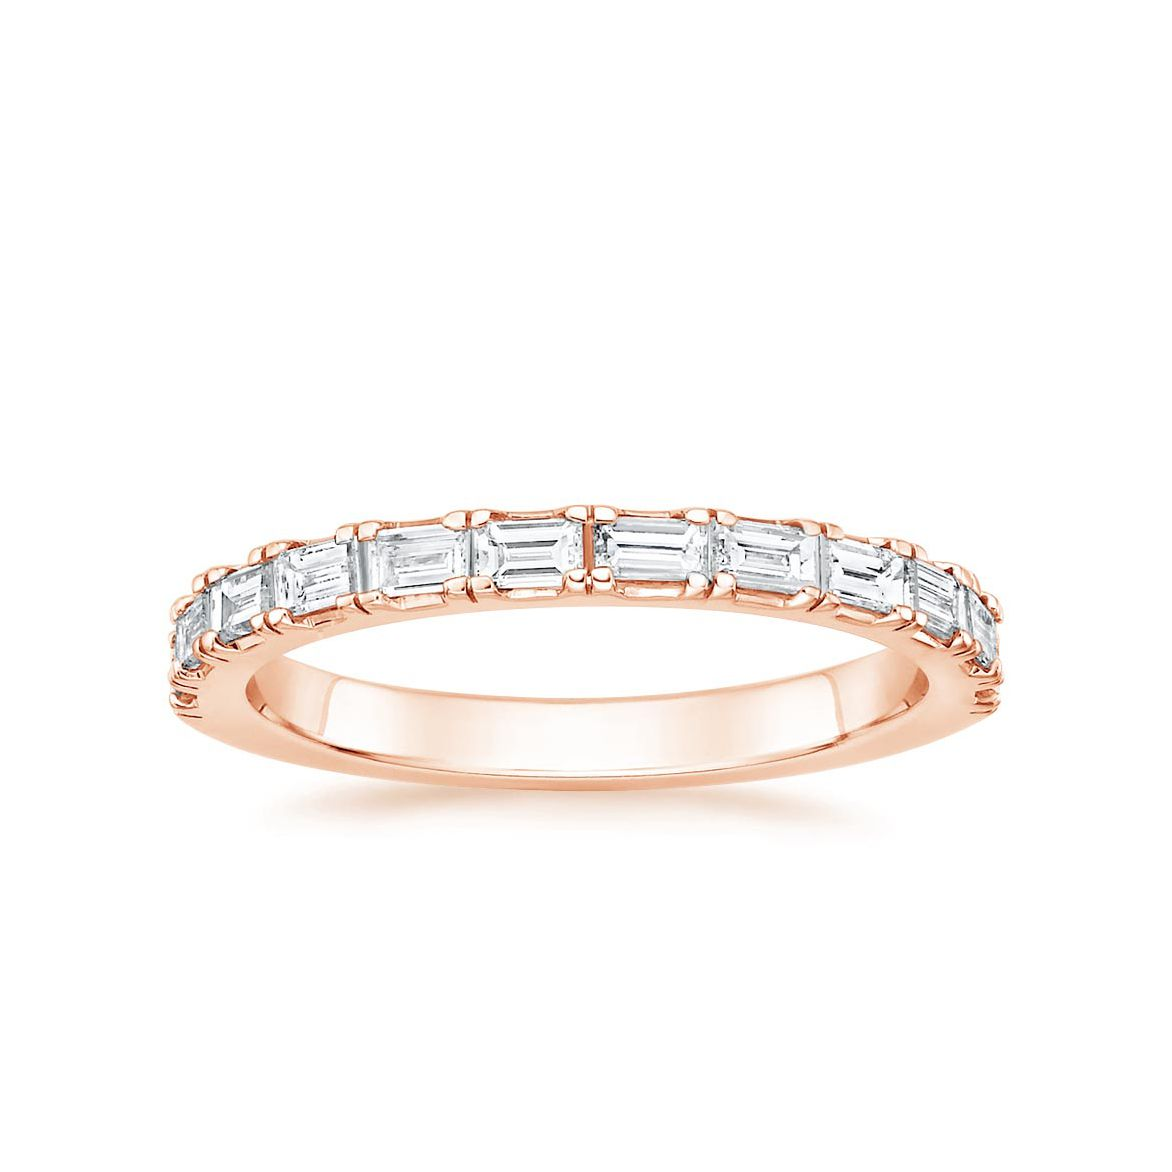 Round Diamond Band Rose Gold Ring Half Eternity Band Eternity Wedding Band Matching Band for Wedding Ring Diamond Band for Her